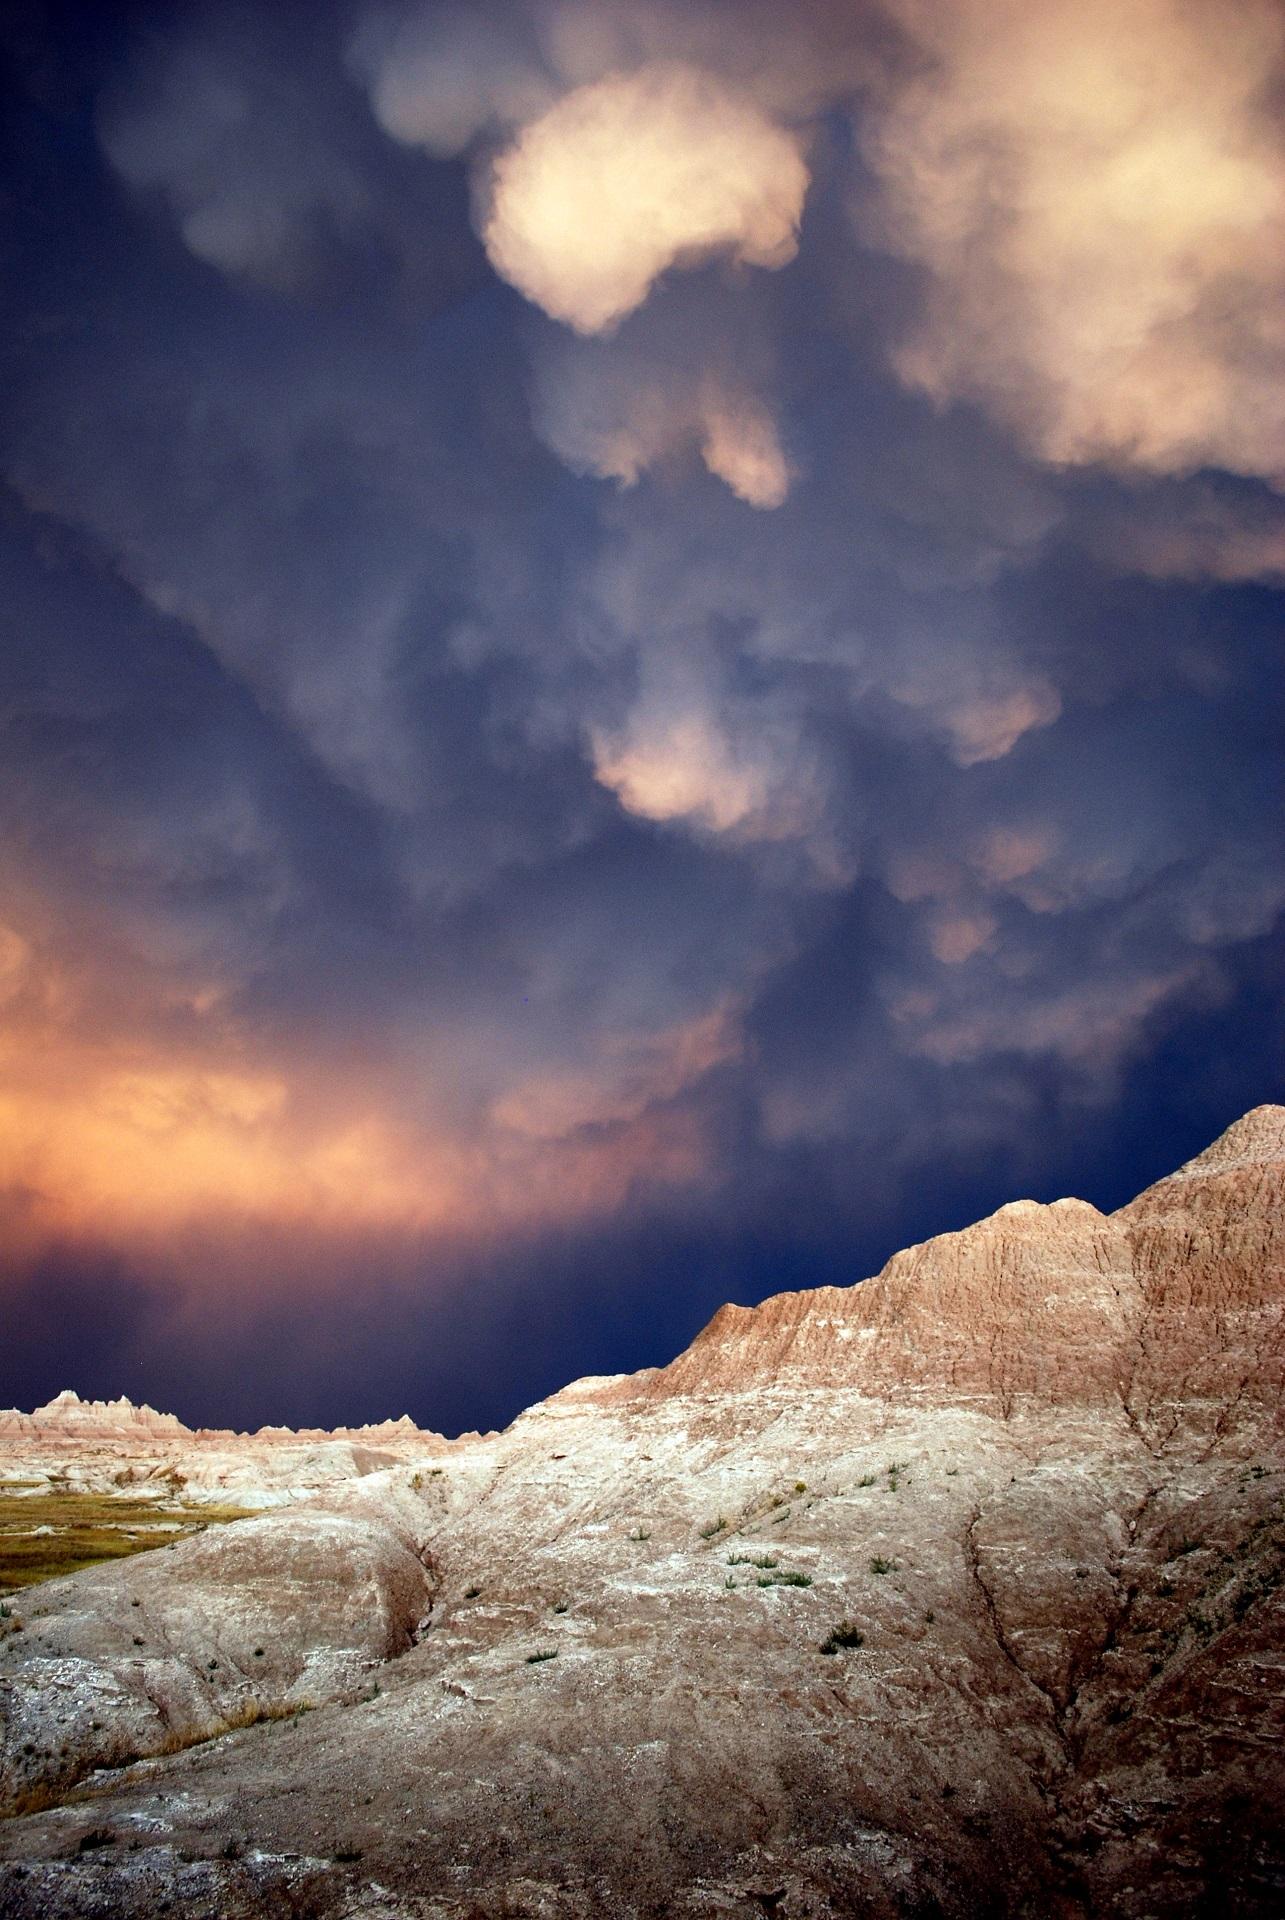 Wallpaper Hd Happy New Year Free Stock Photo Of Badlands National Park Cloud Cloudburst